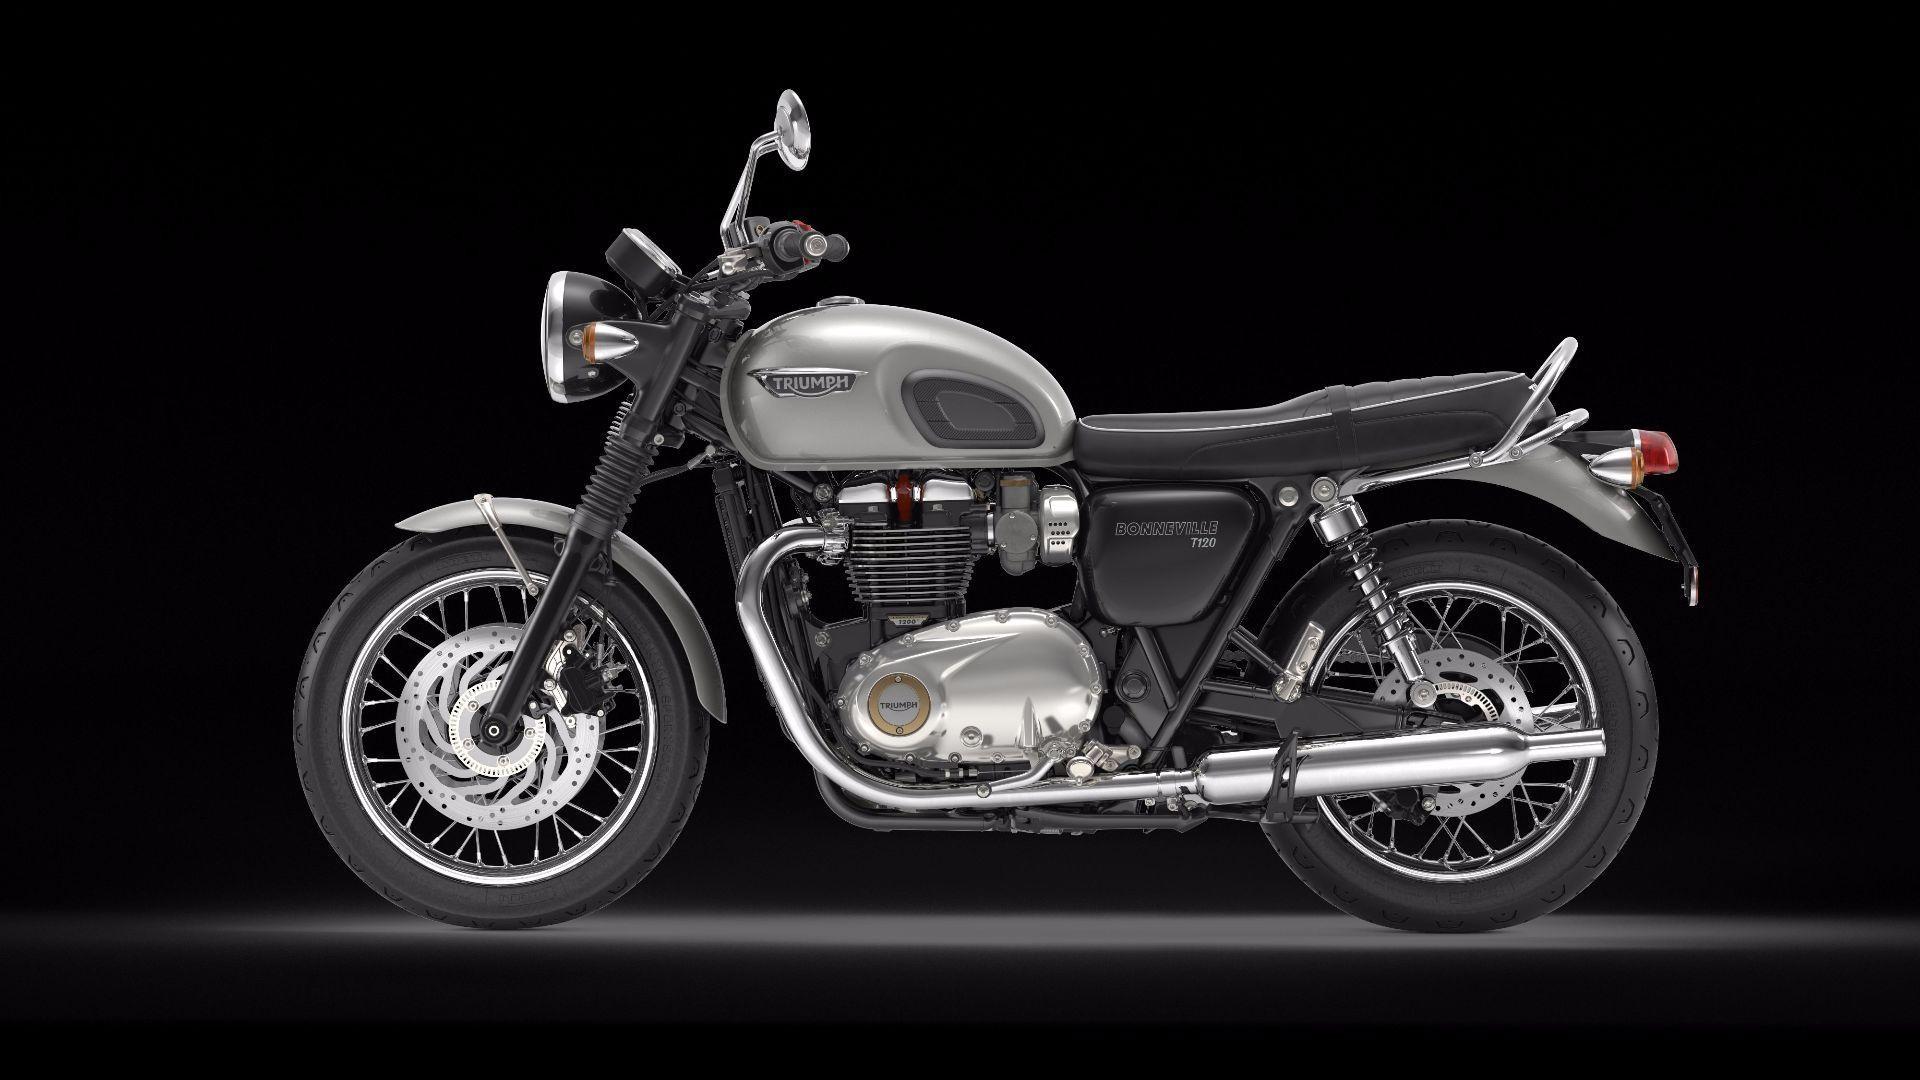 motorrad neufahrzeug kaufen triumph bonneville t120 1200 abs color new 2018 st dler motos ag widnau. Black Bedroom Furniture Sets. Home Design Ideas